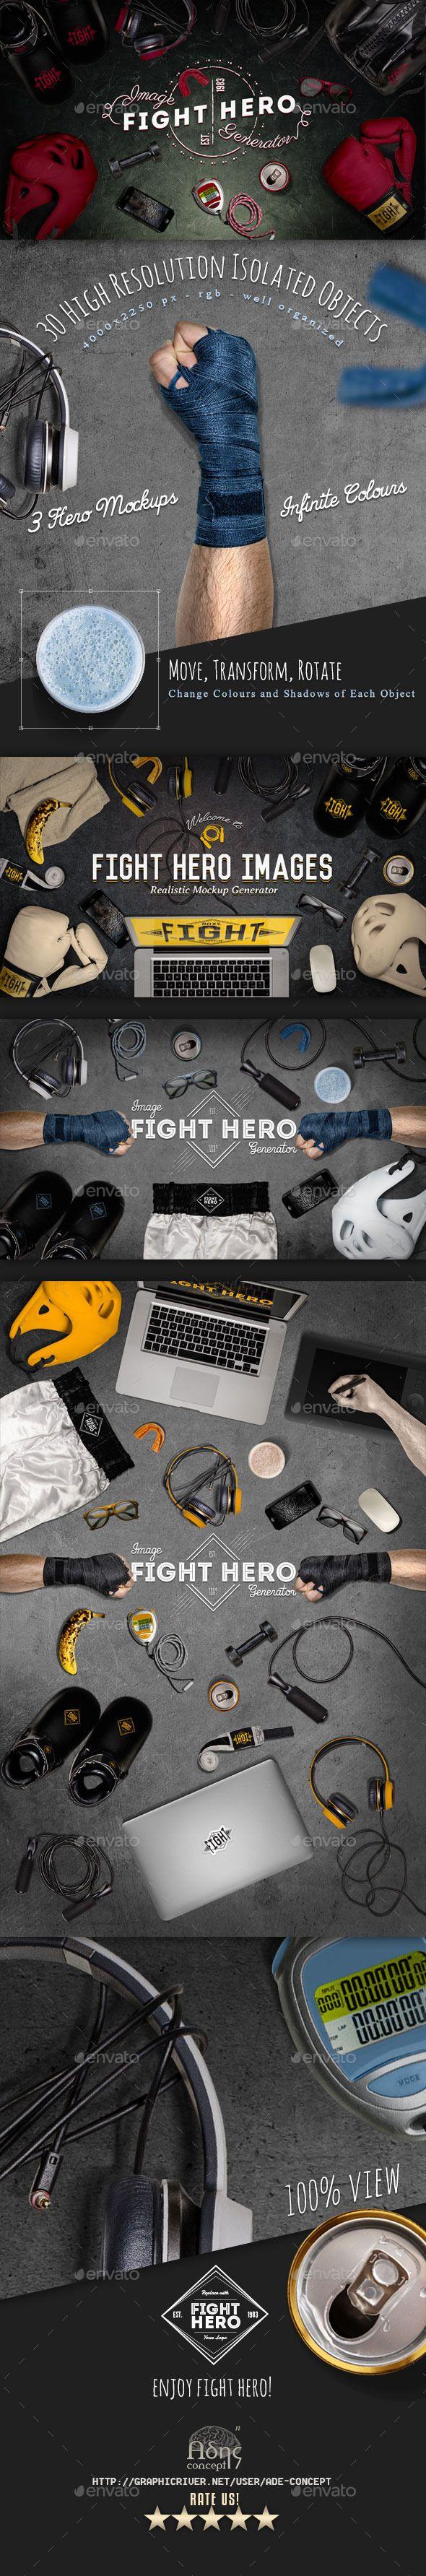 Poster design generator - Fight Sport Hero Image Generator